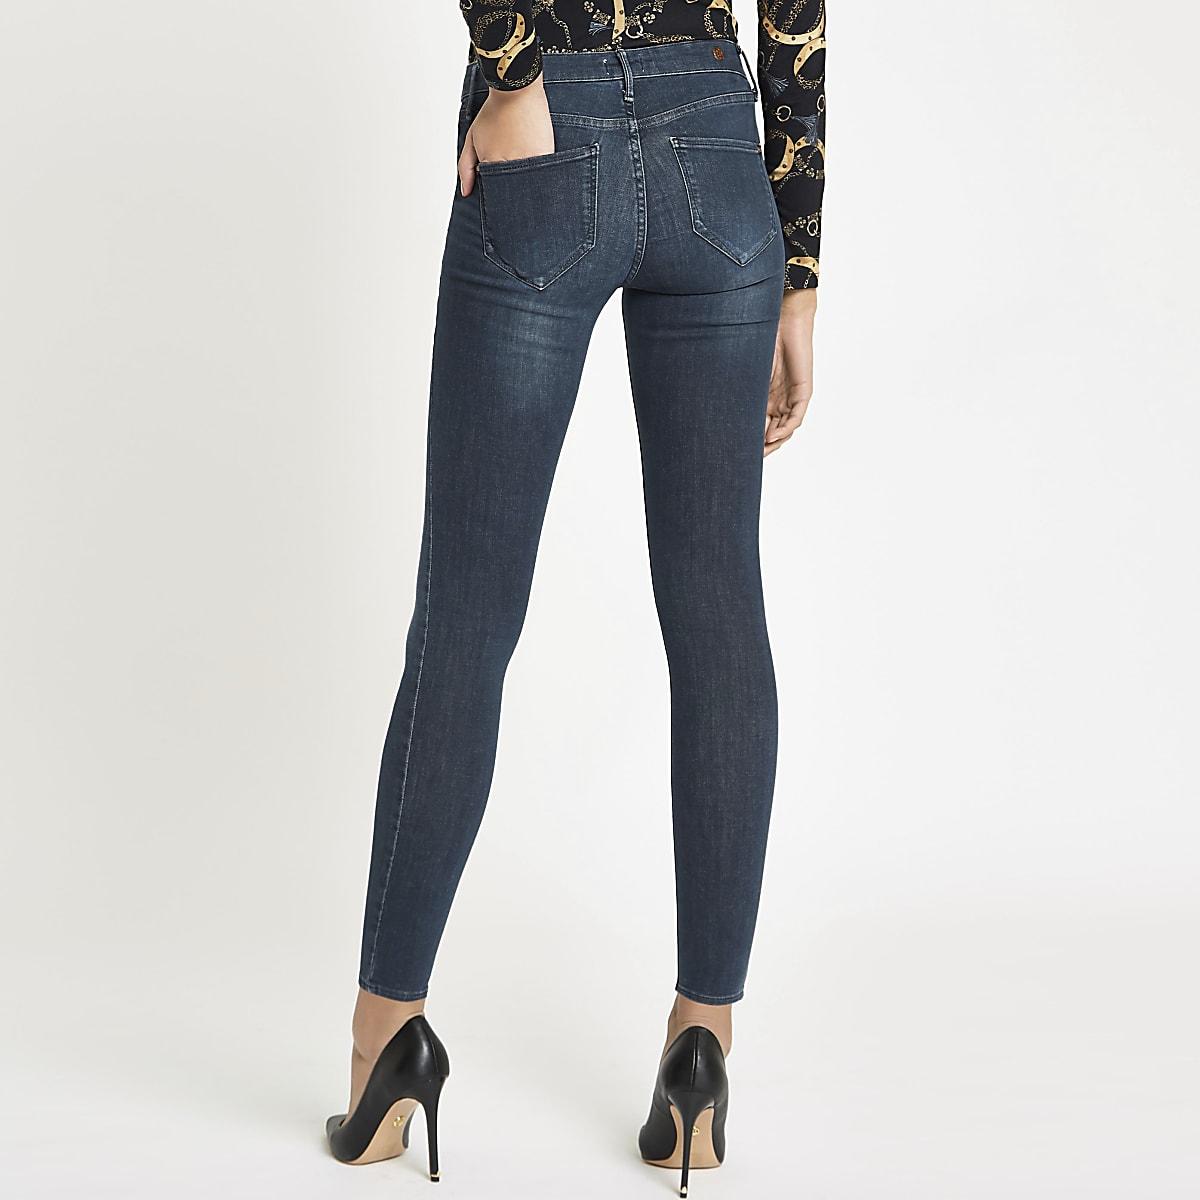 7d43a53b016c6 Dark grey Molly mid rise jeggings - Jeggings - Jeans - women